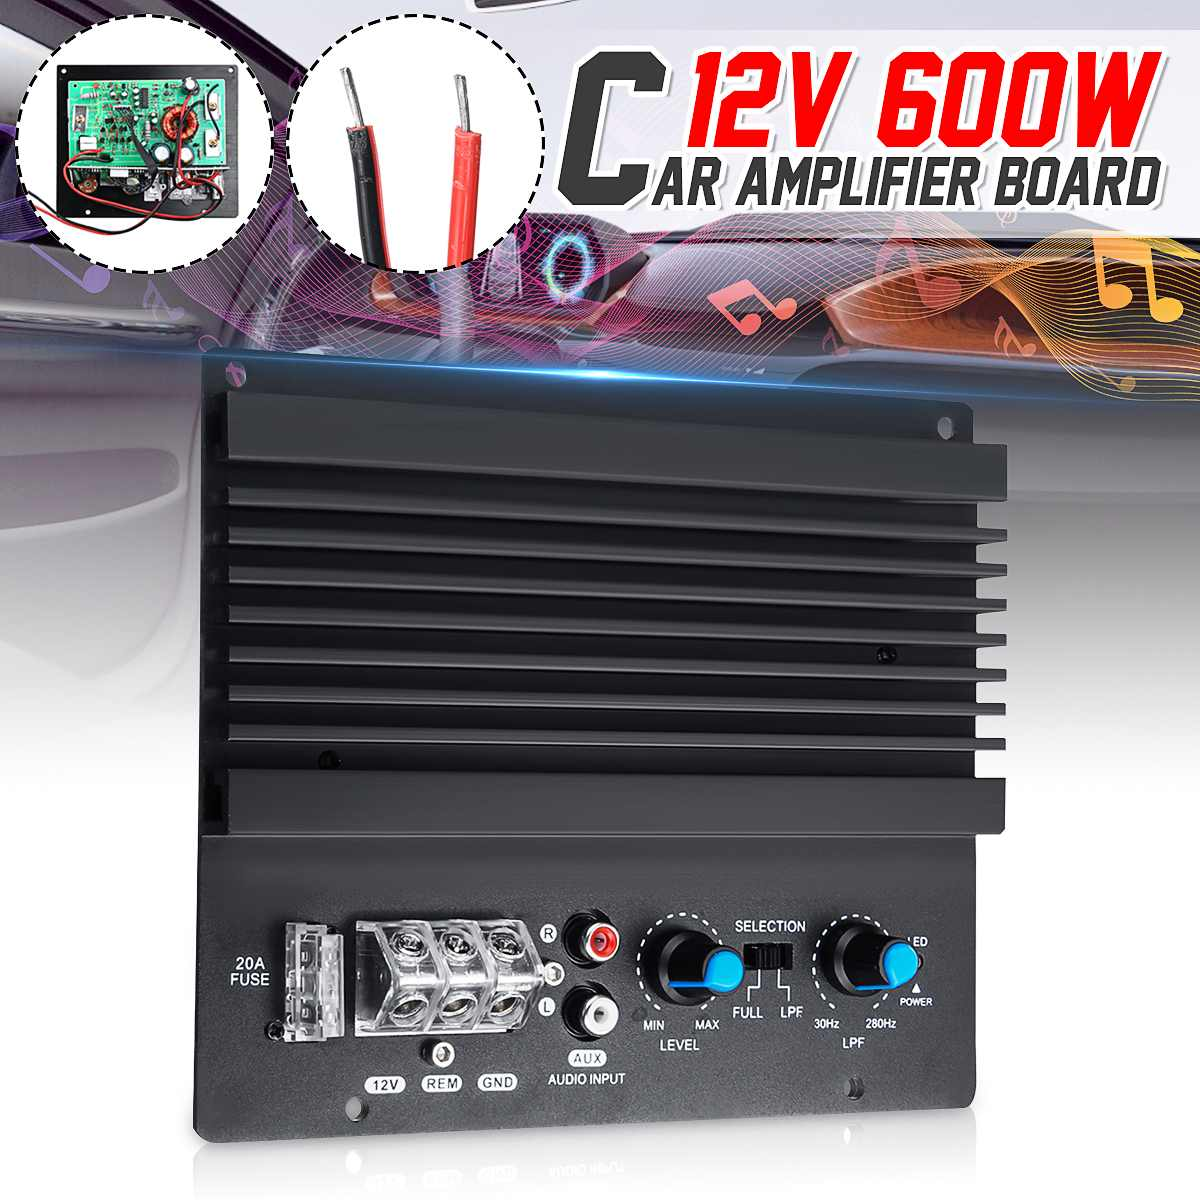 12V 600W High Power Car Audio Amplifier Subwoofer Amplifier Board Mono Amp Board Automotive Amplifier Module